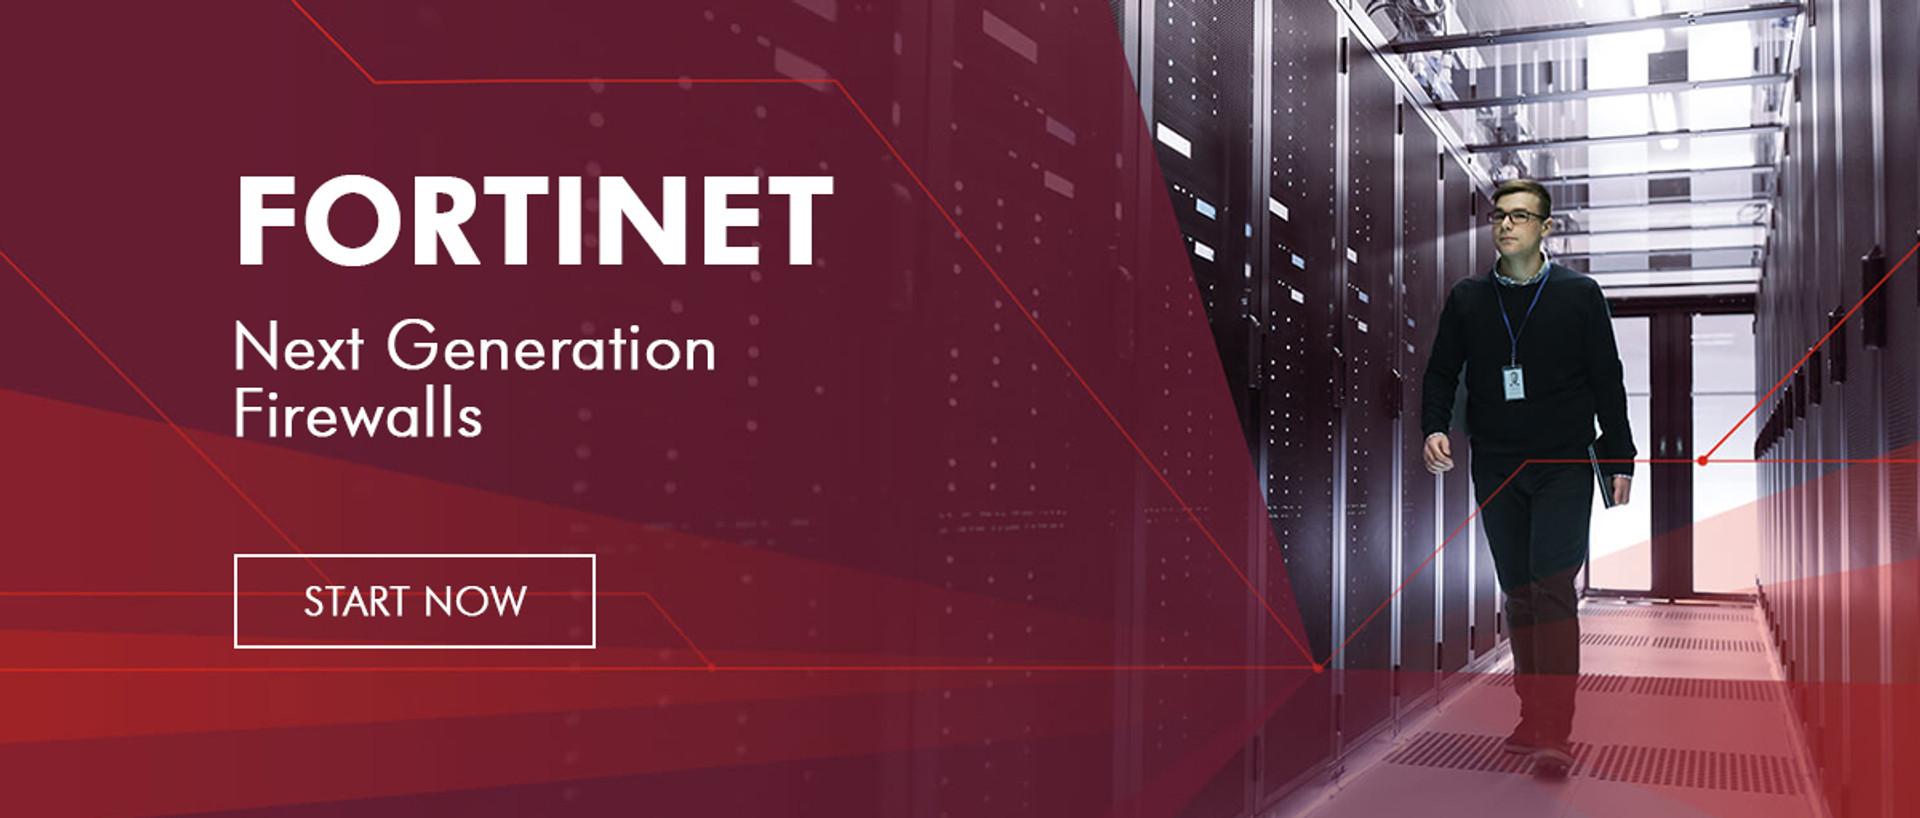 Fortinet Next Generation Firewarll